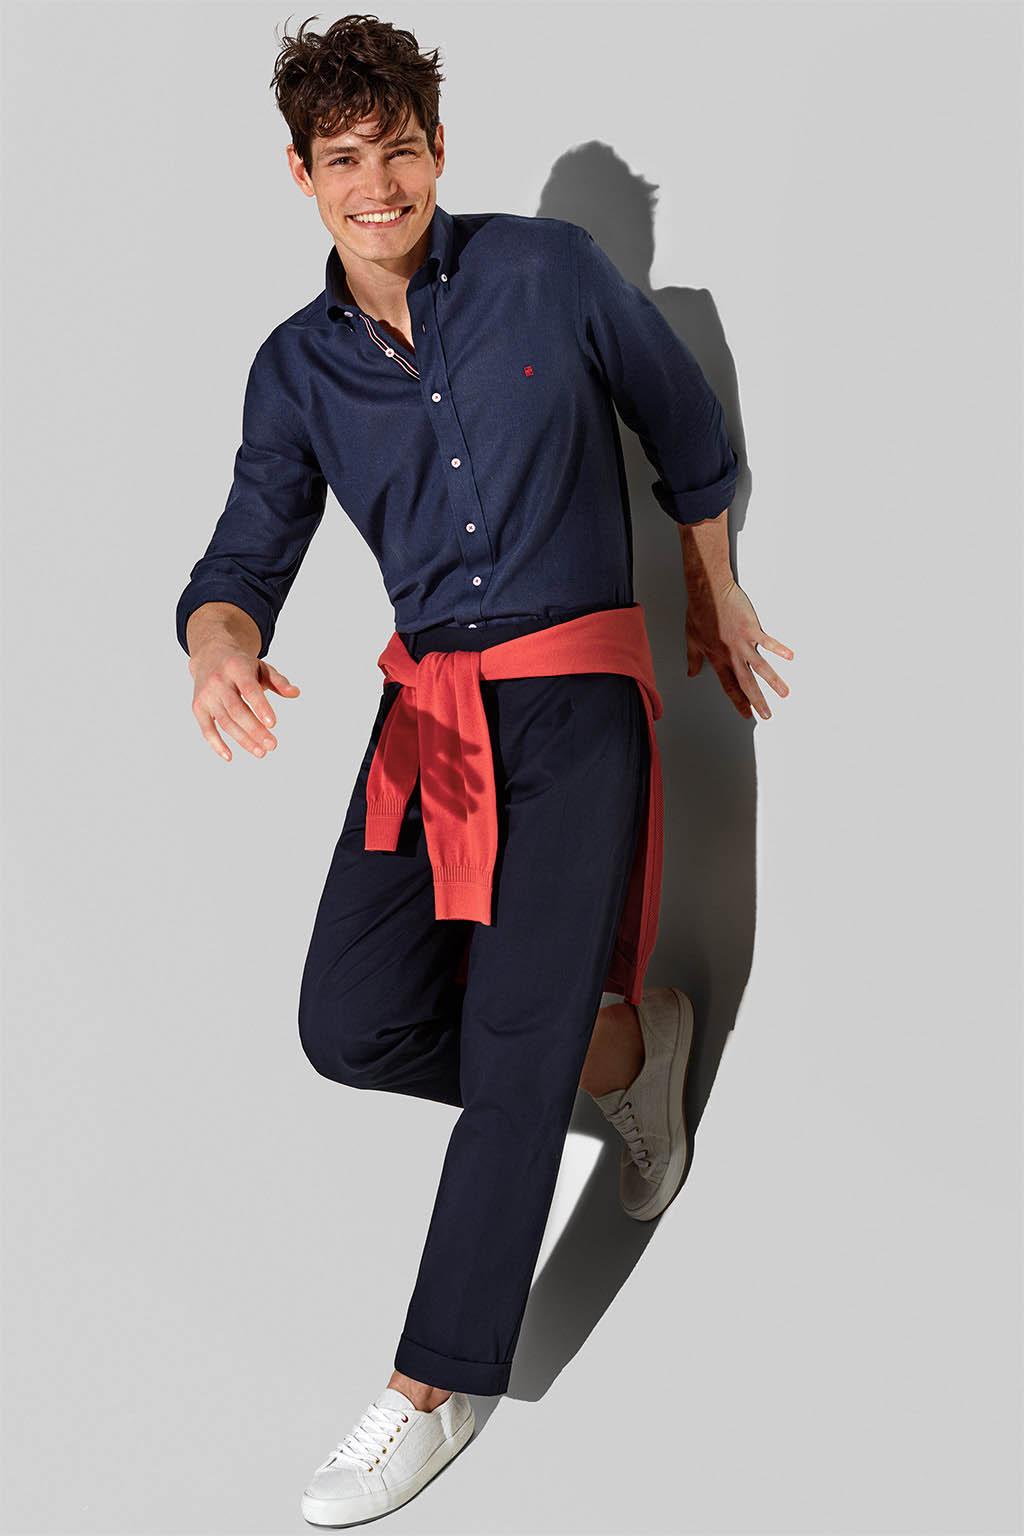 CH Carolina Herrera. New Menswear Collection Summer. Look 05